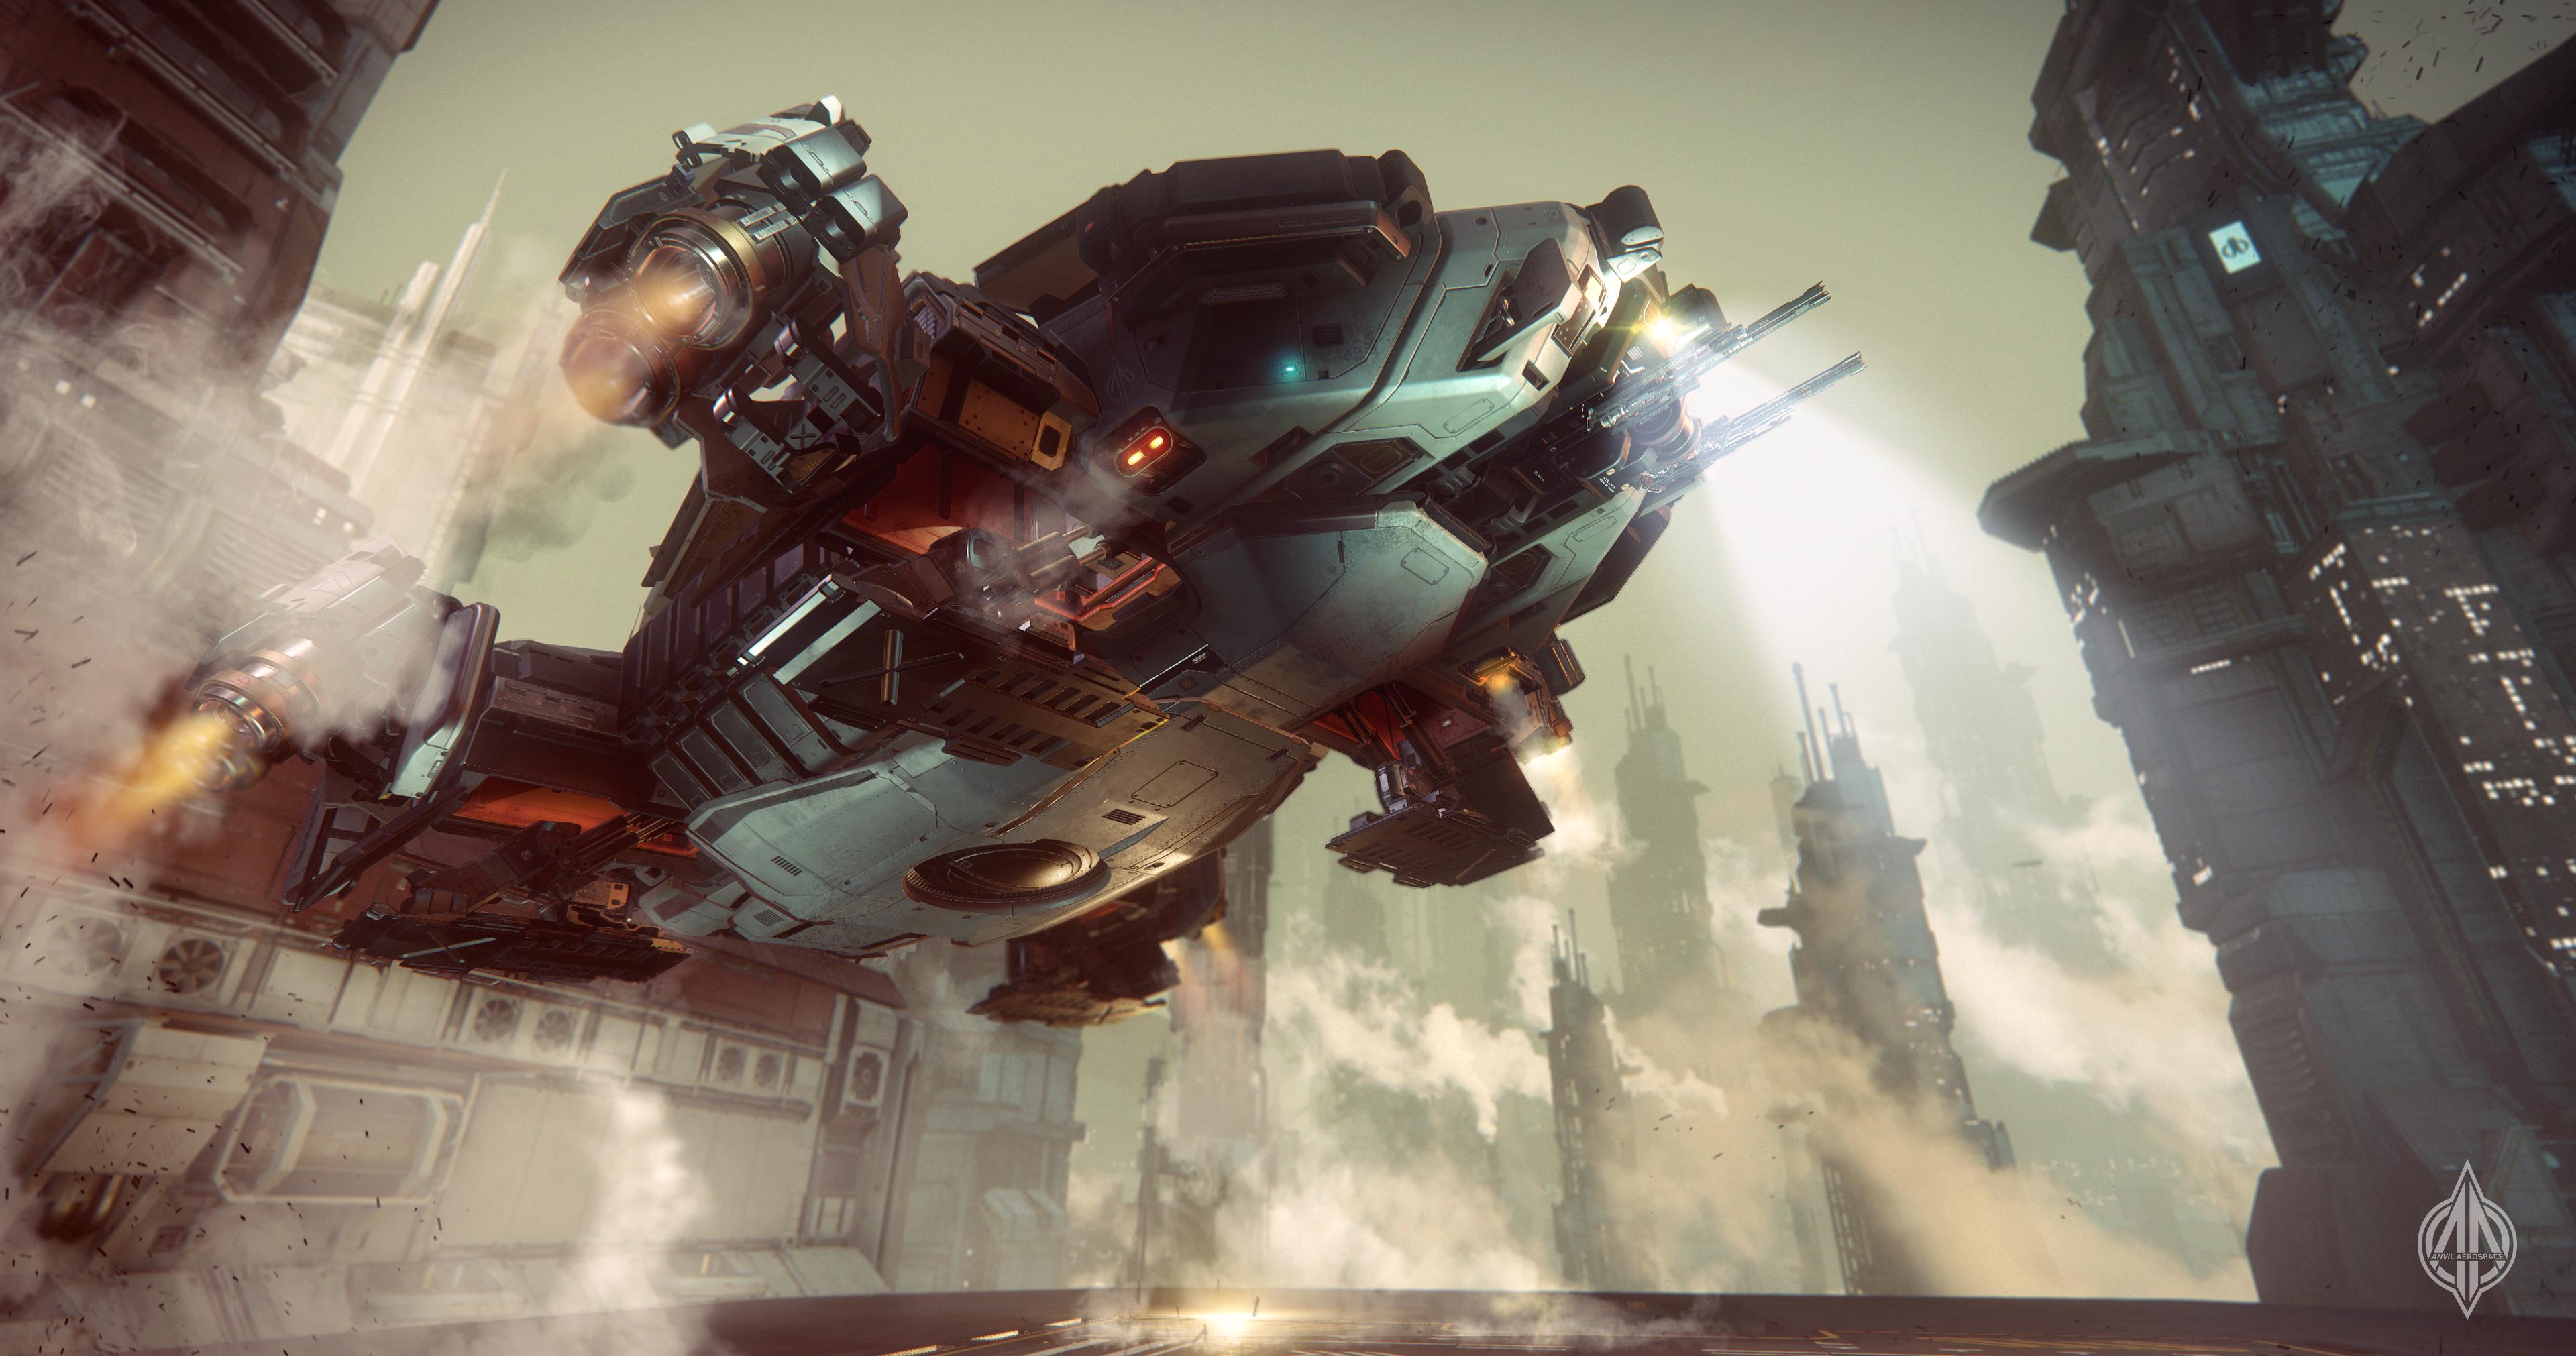 Follow the development of Star Citizen and Squadron 42